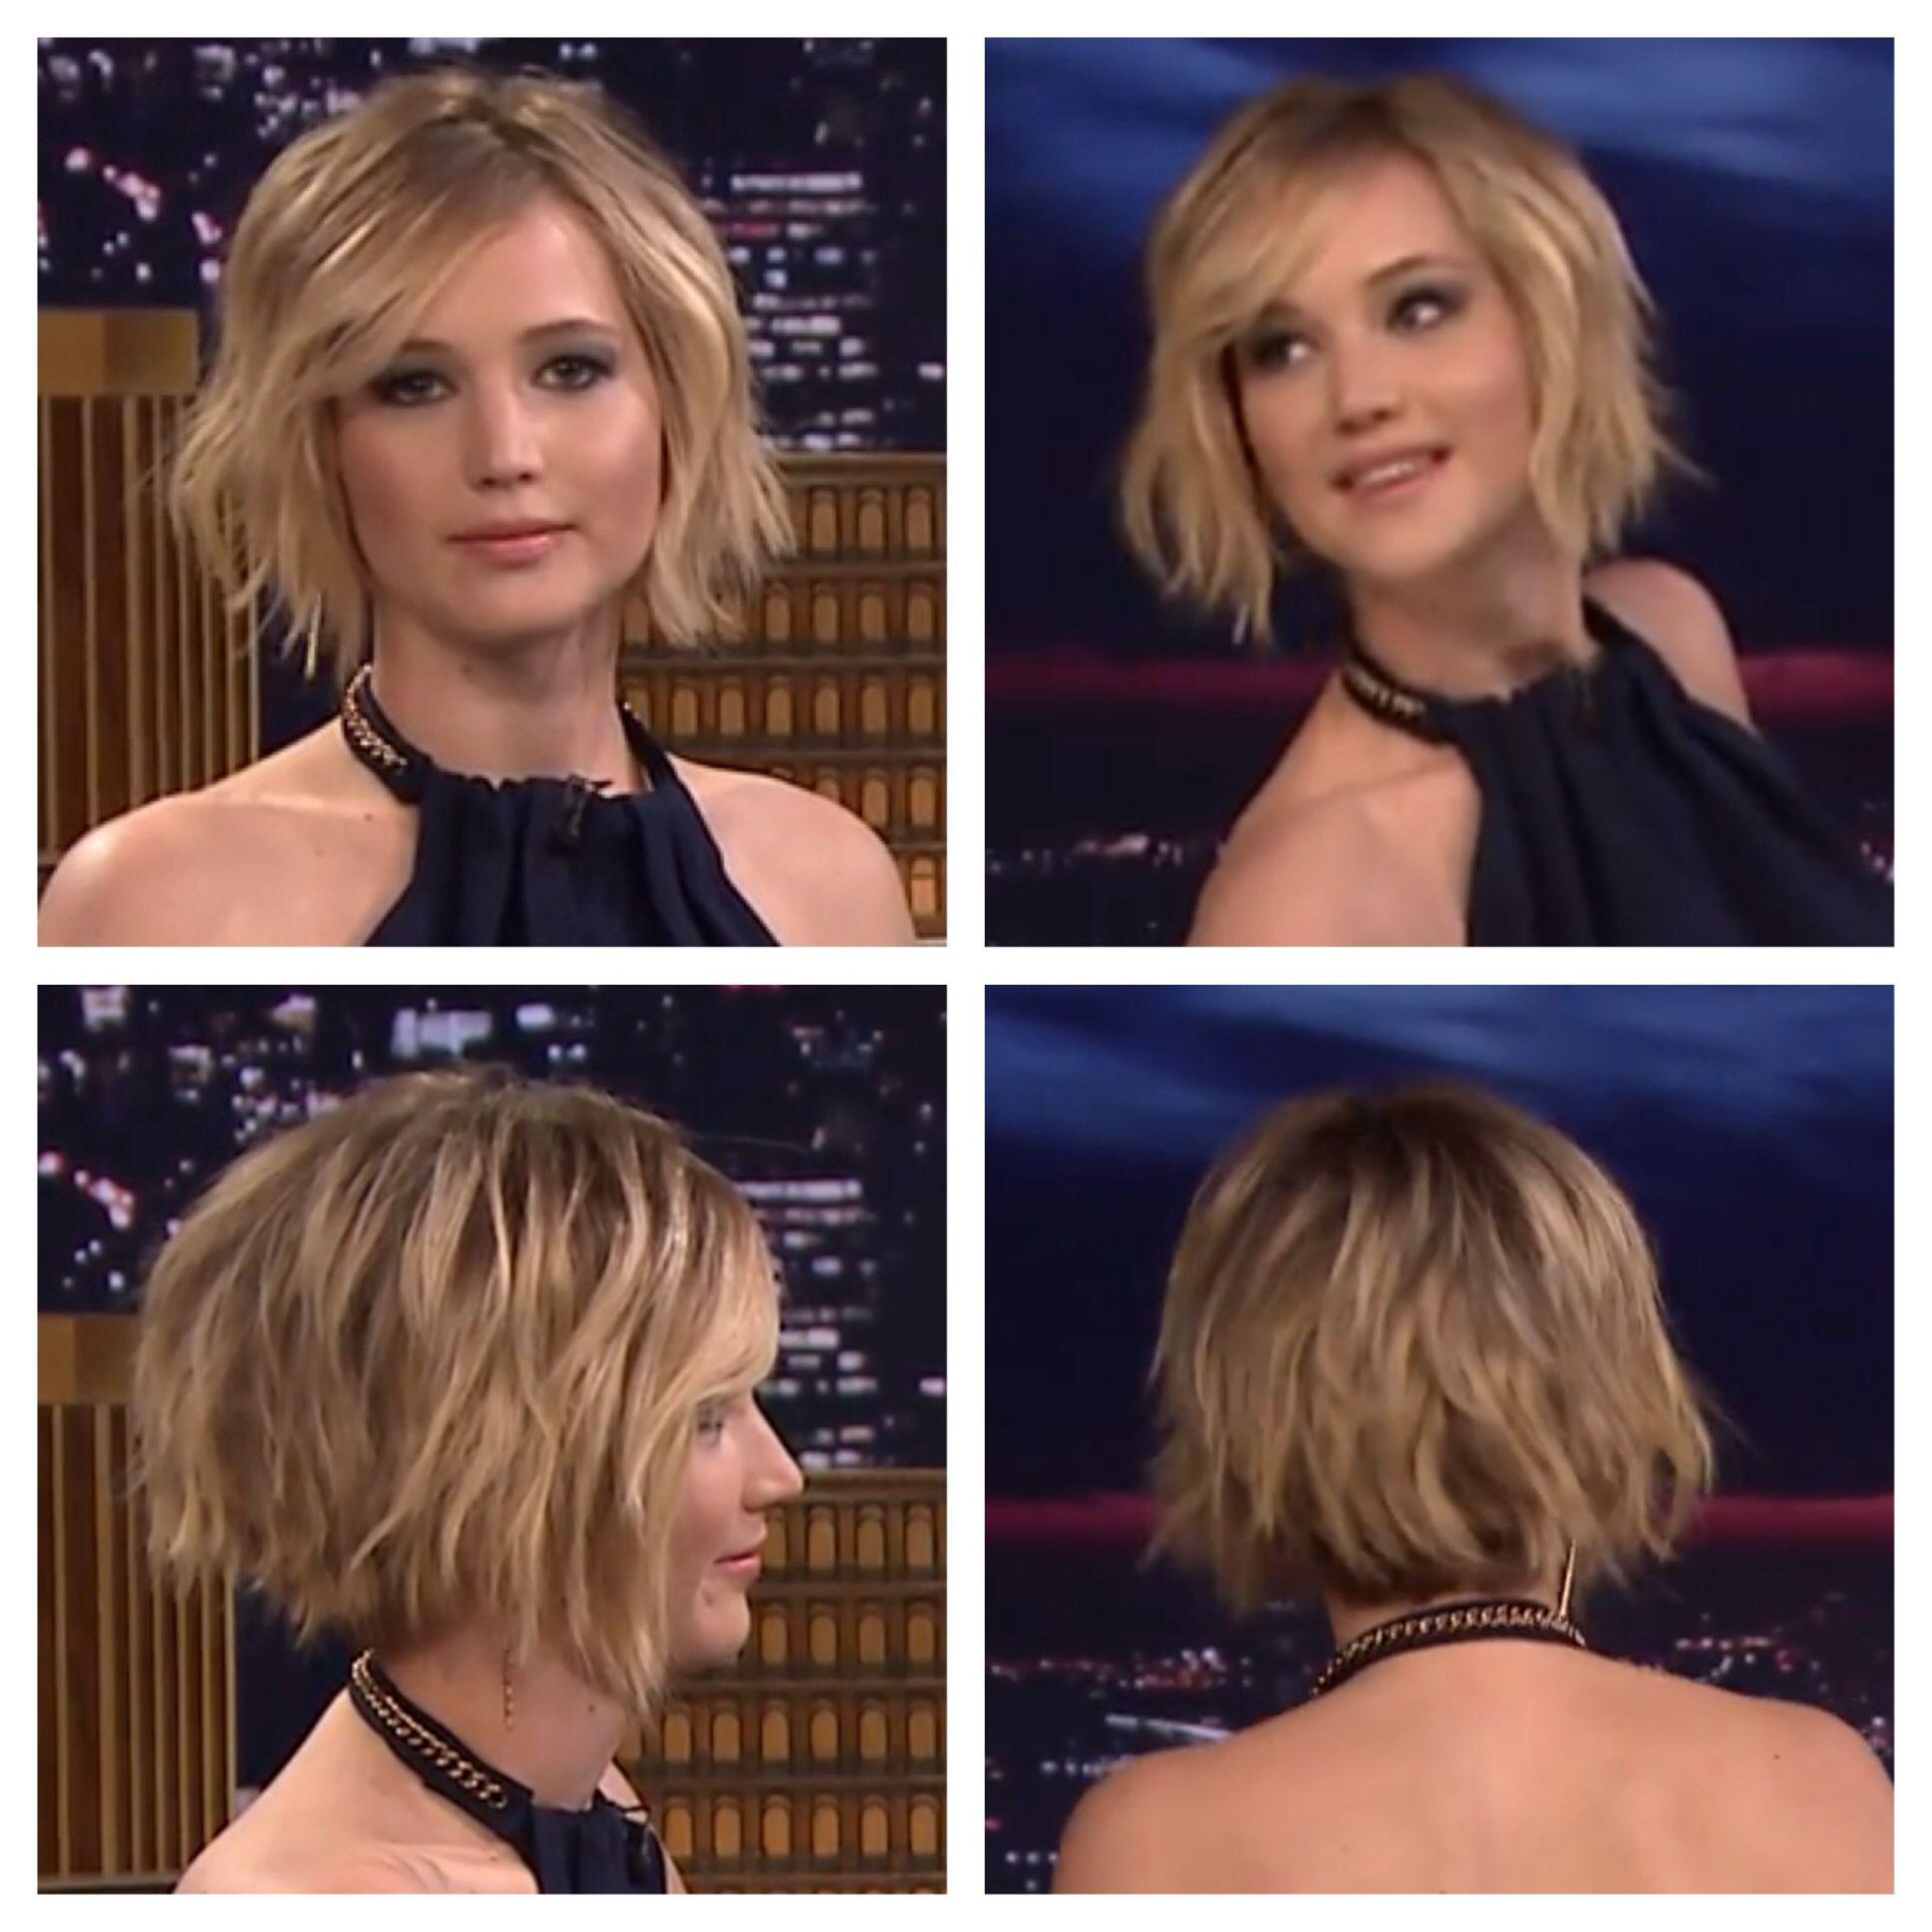 Jennifer Lawrence On Jimmy Fallon Short Choppy Bob Haircut Blonde W Light Brown Low Lights Stijle Kapsels Golvende Bob Kapsels Schokkerig Bob Kapsels